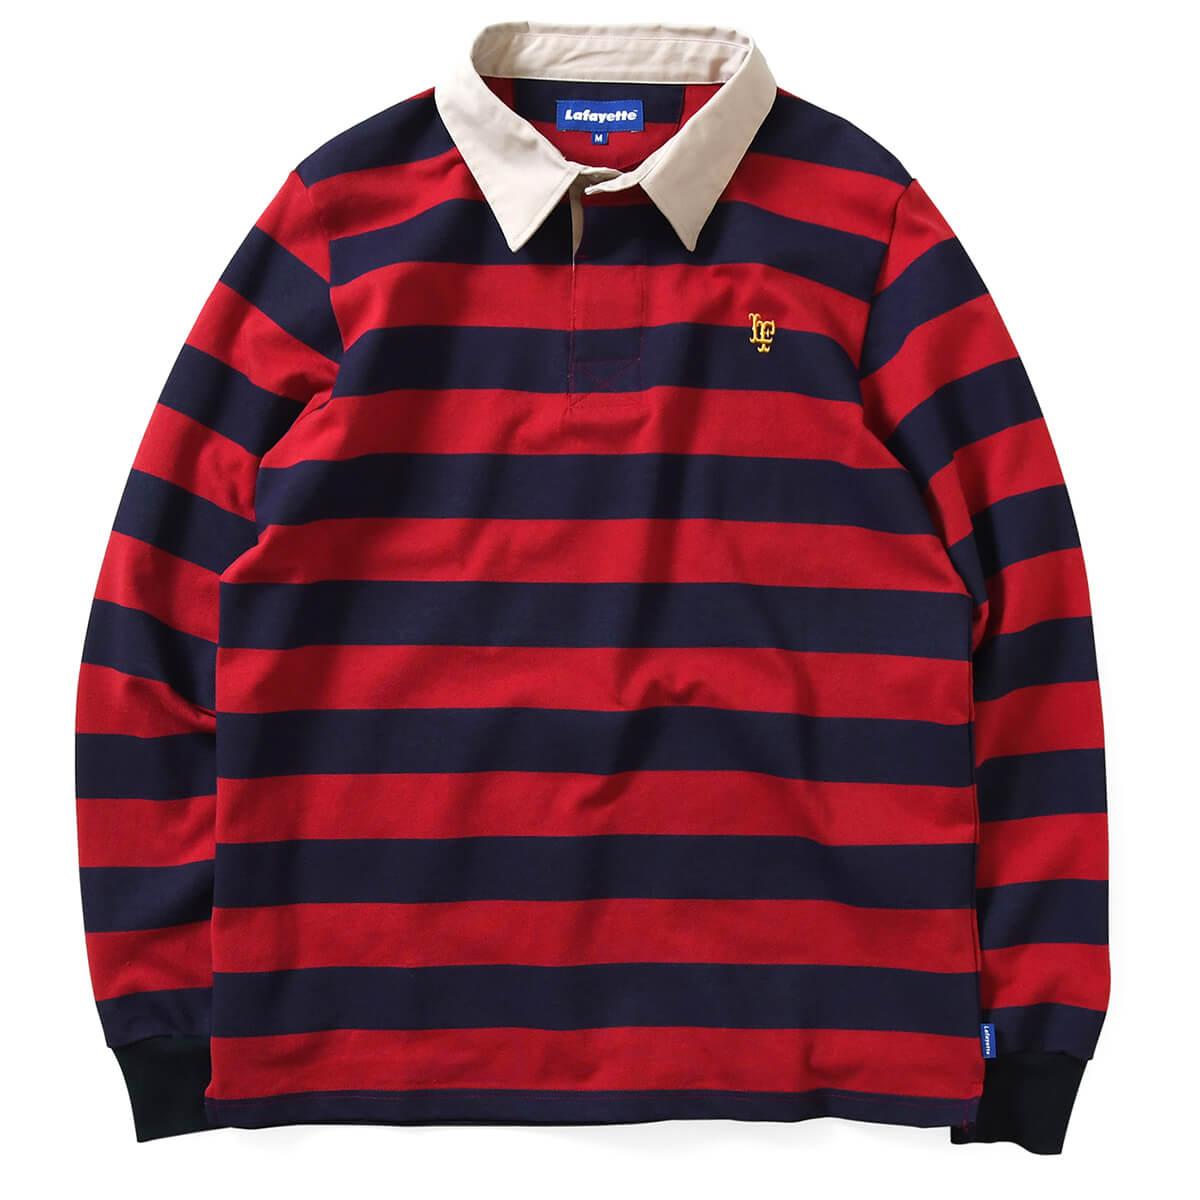 Lafayette ラファイエット ストライプ ラガーシャツ メンズ 男性 トップス シャツ ブランド ストリート LF LOGO STRIPED RUGBY SHIRT LS200301 BURGUNDY バーガンディー